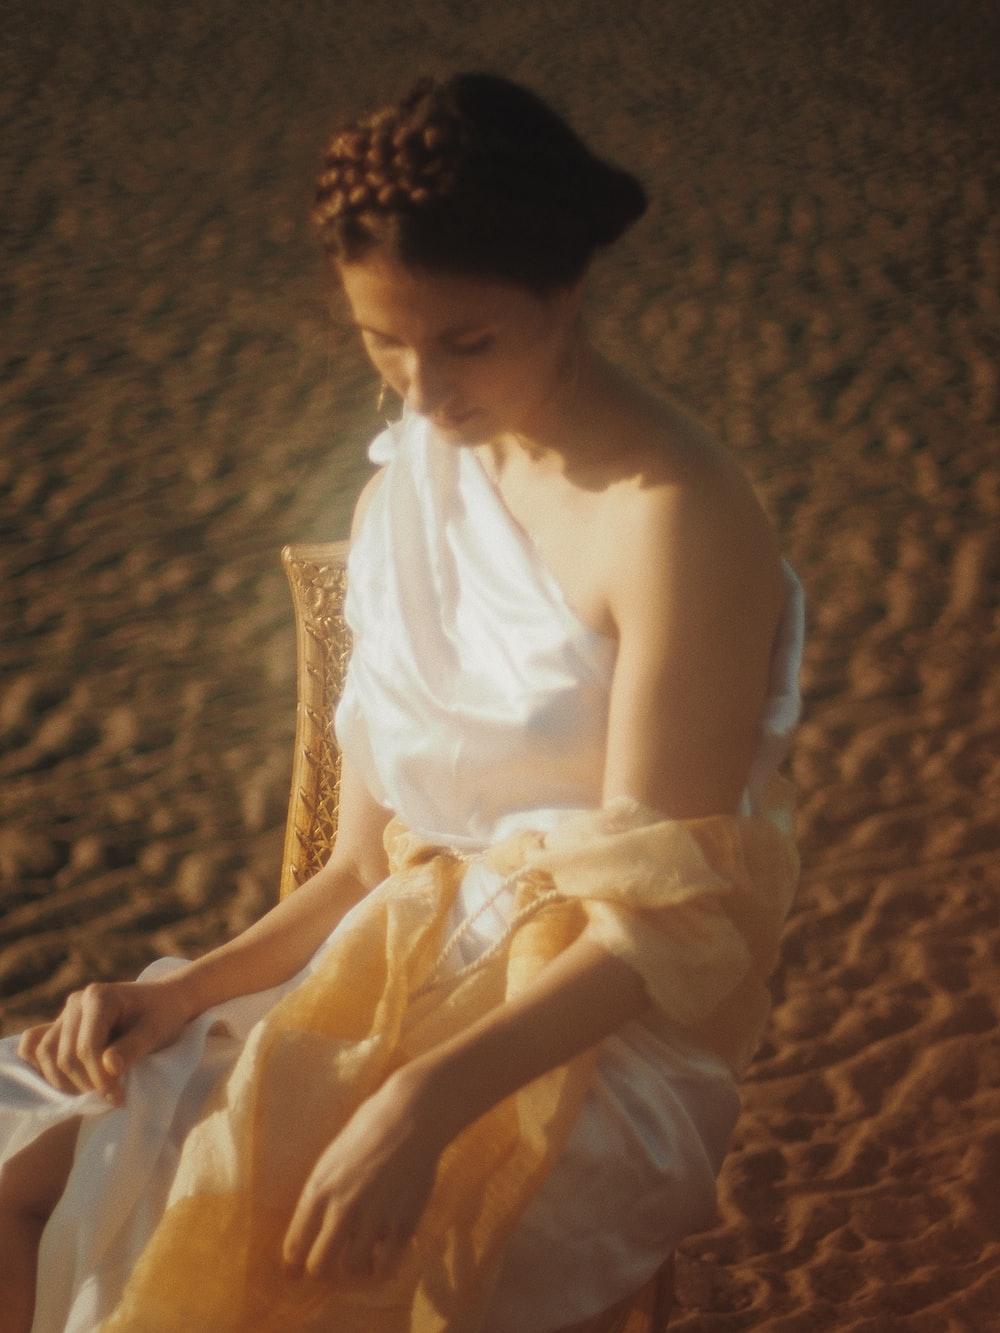 woman in white sleeveless dress sitting on brown textile